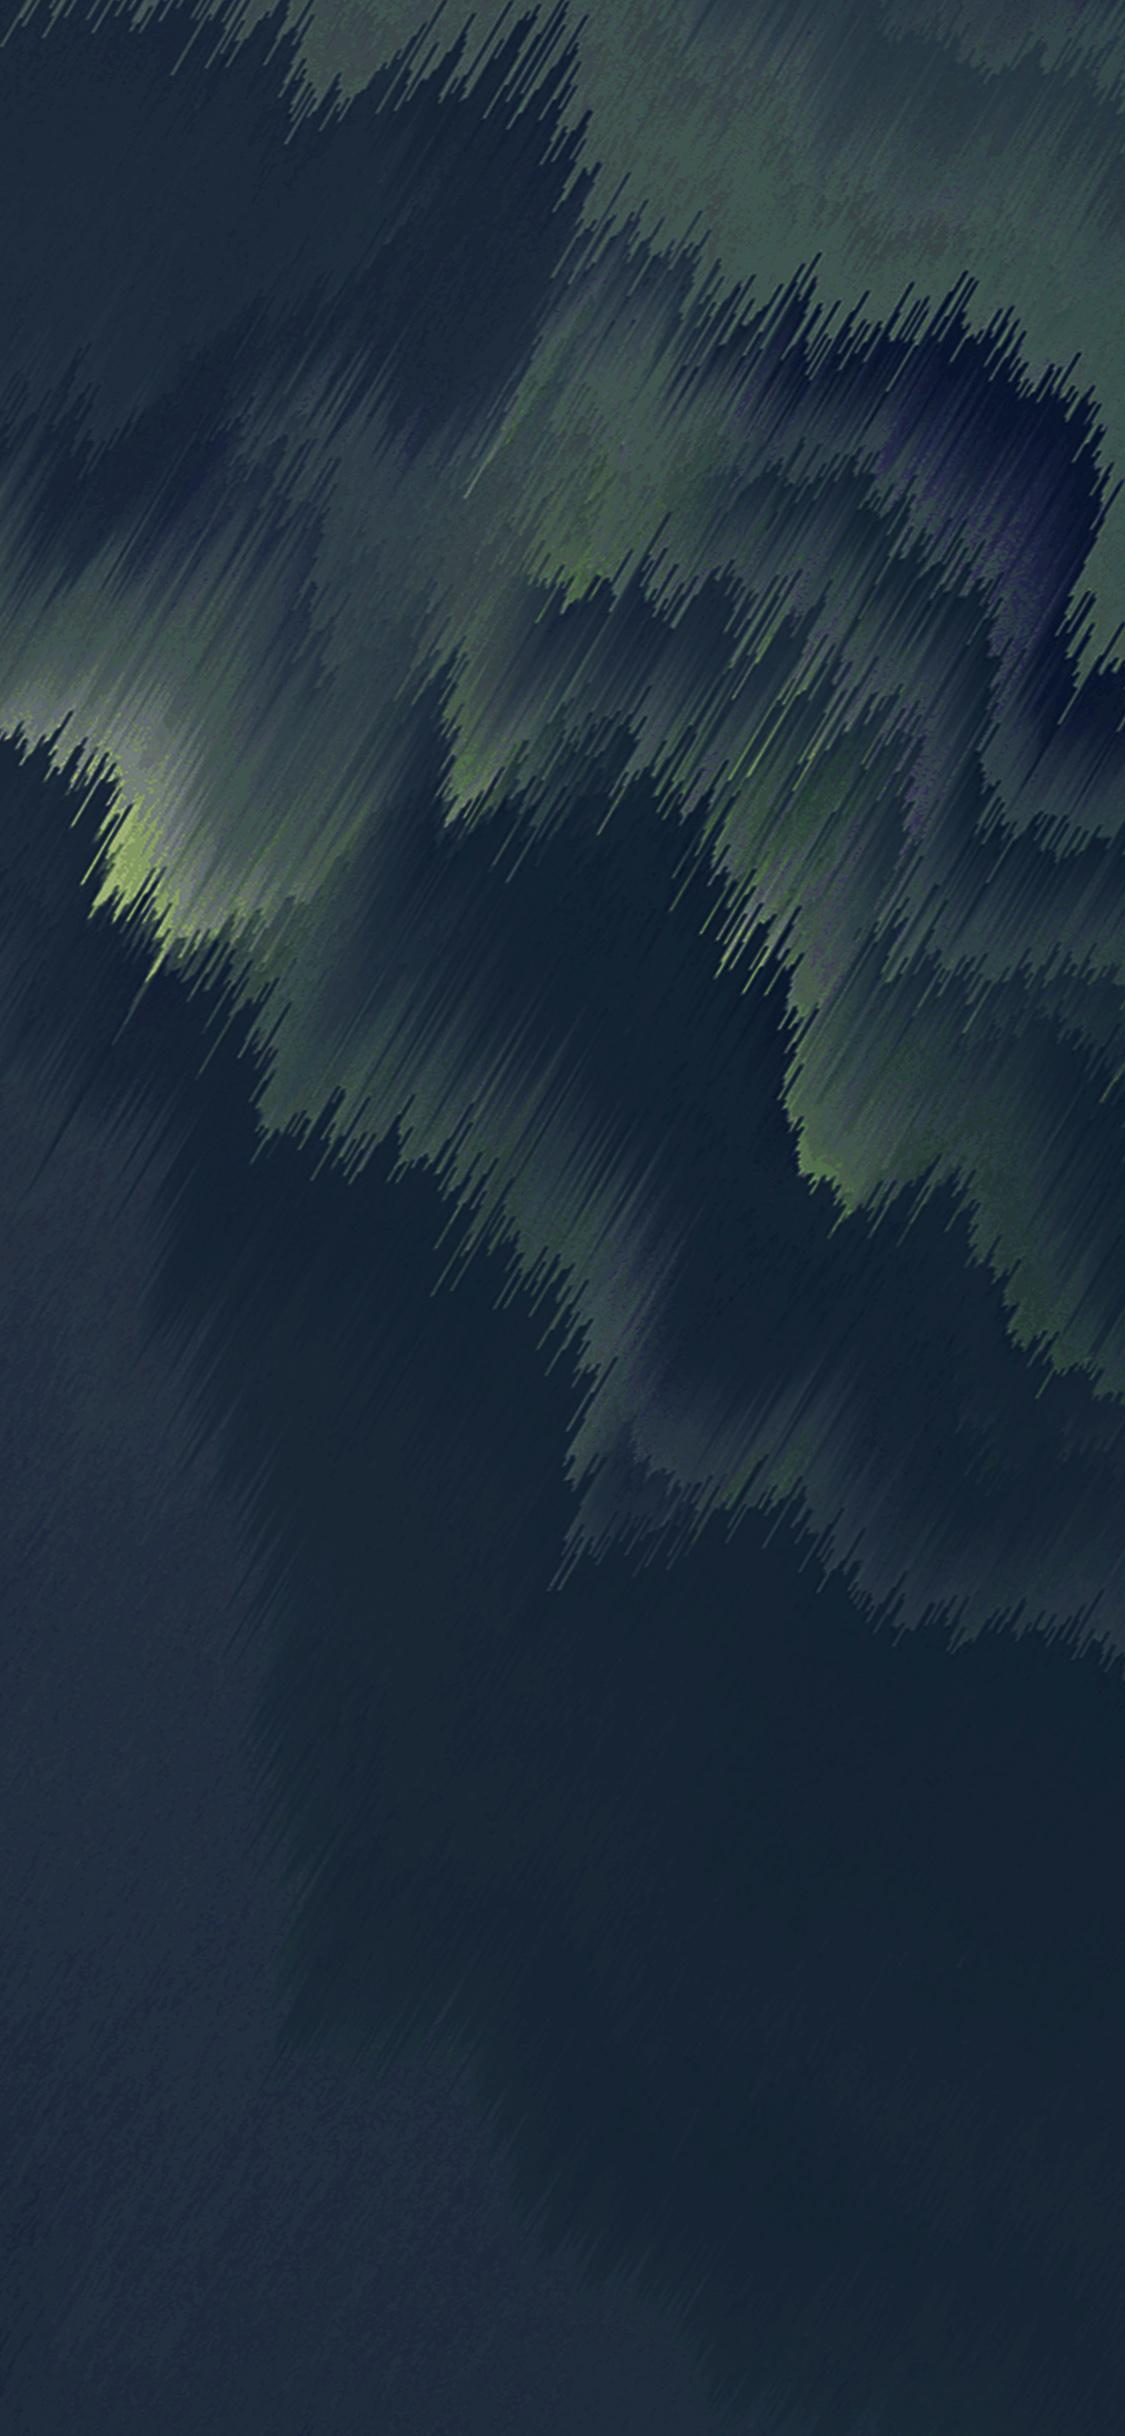 iPhonexpapers.com-Apple-iPhone-wallpaper-vv52-dark-moving-dot-line-pattern-background-blue